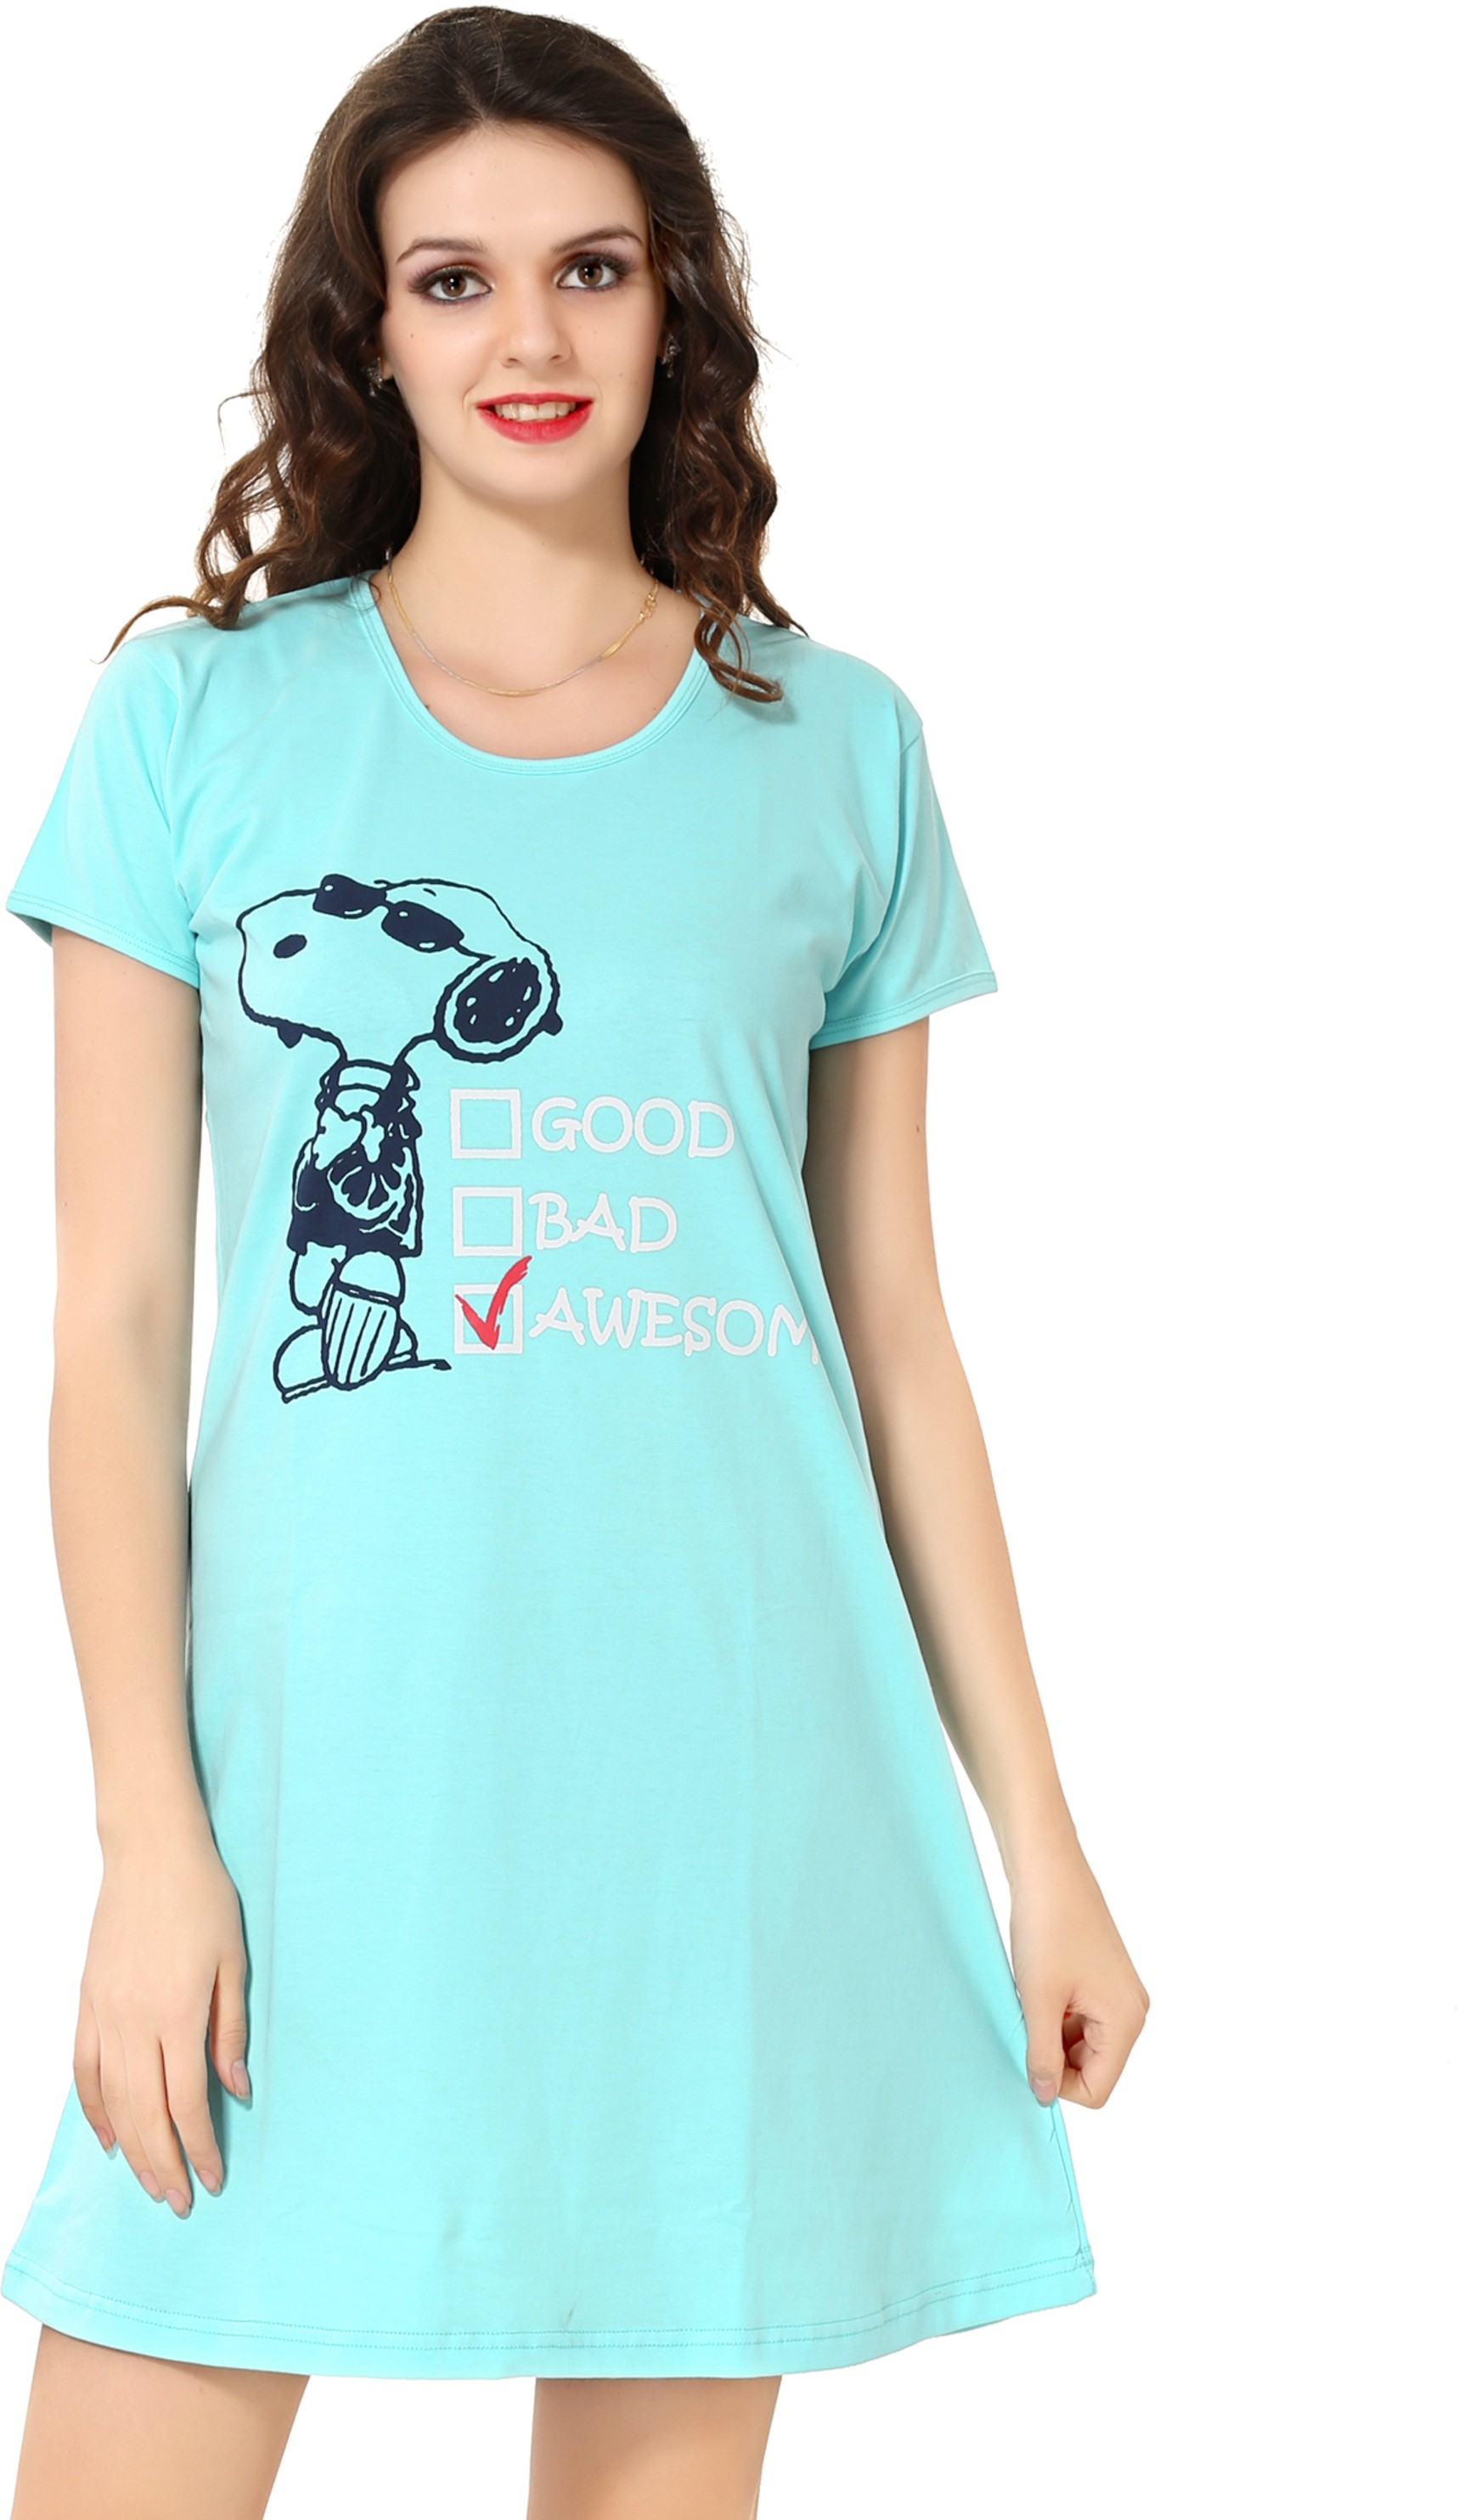 Deals - Gwalior - Bras & Panties <br> Lingerie & Sleepwear<br> Category - clothing<br> Business - Flipkart.com